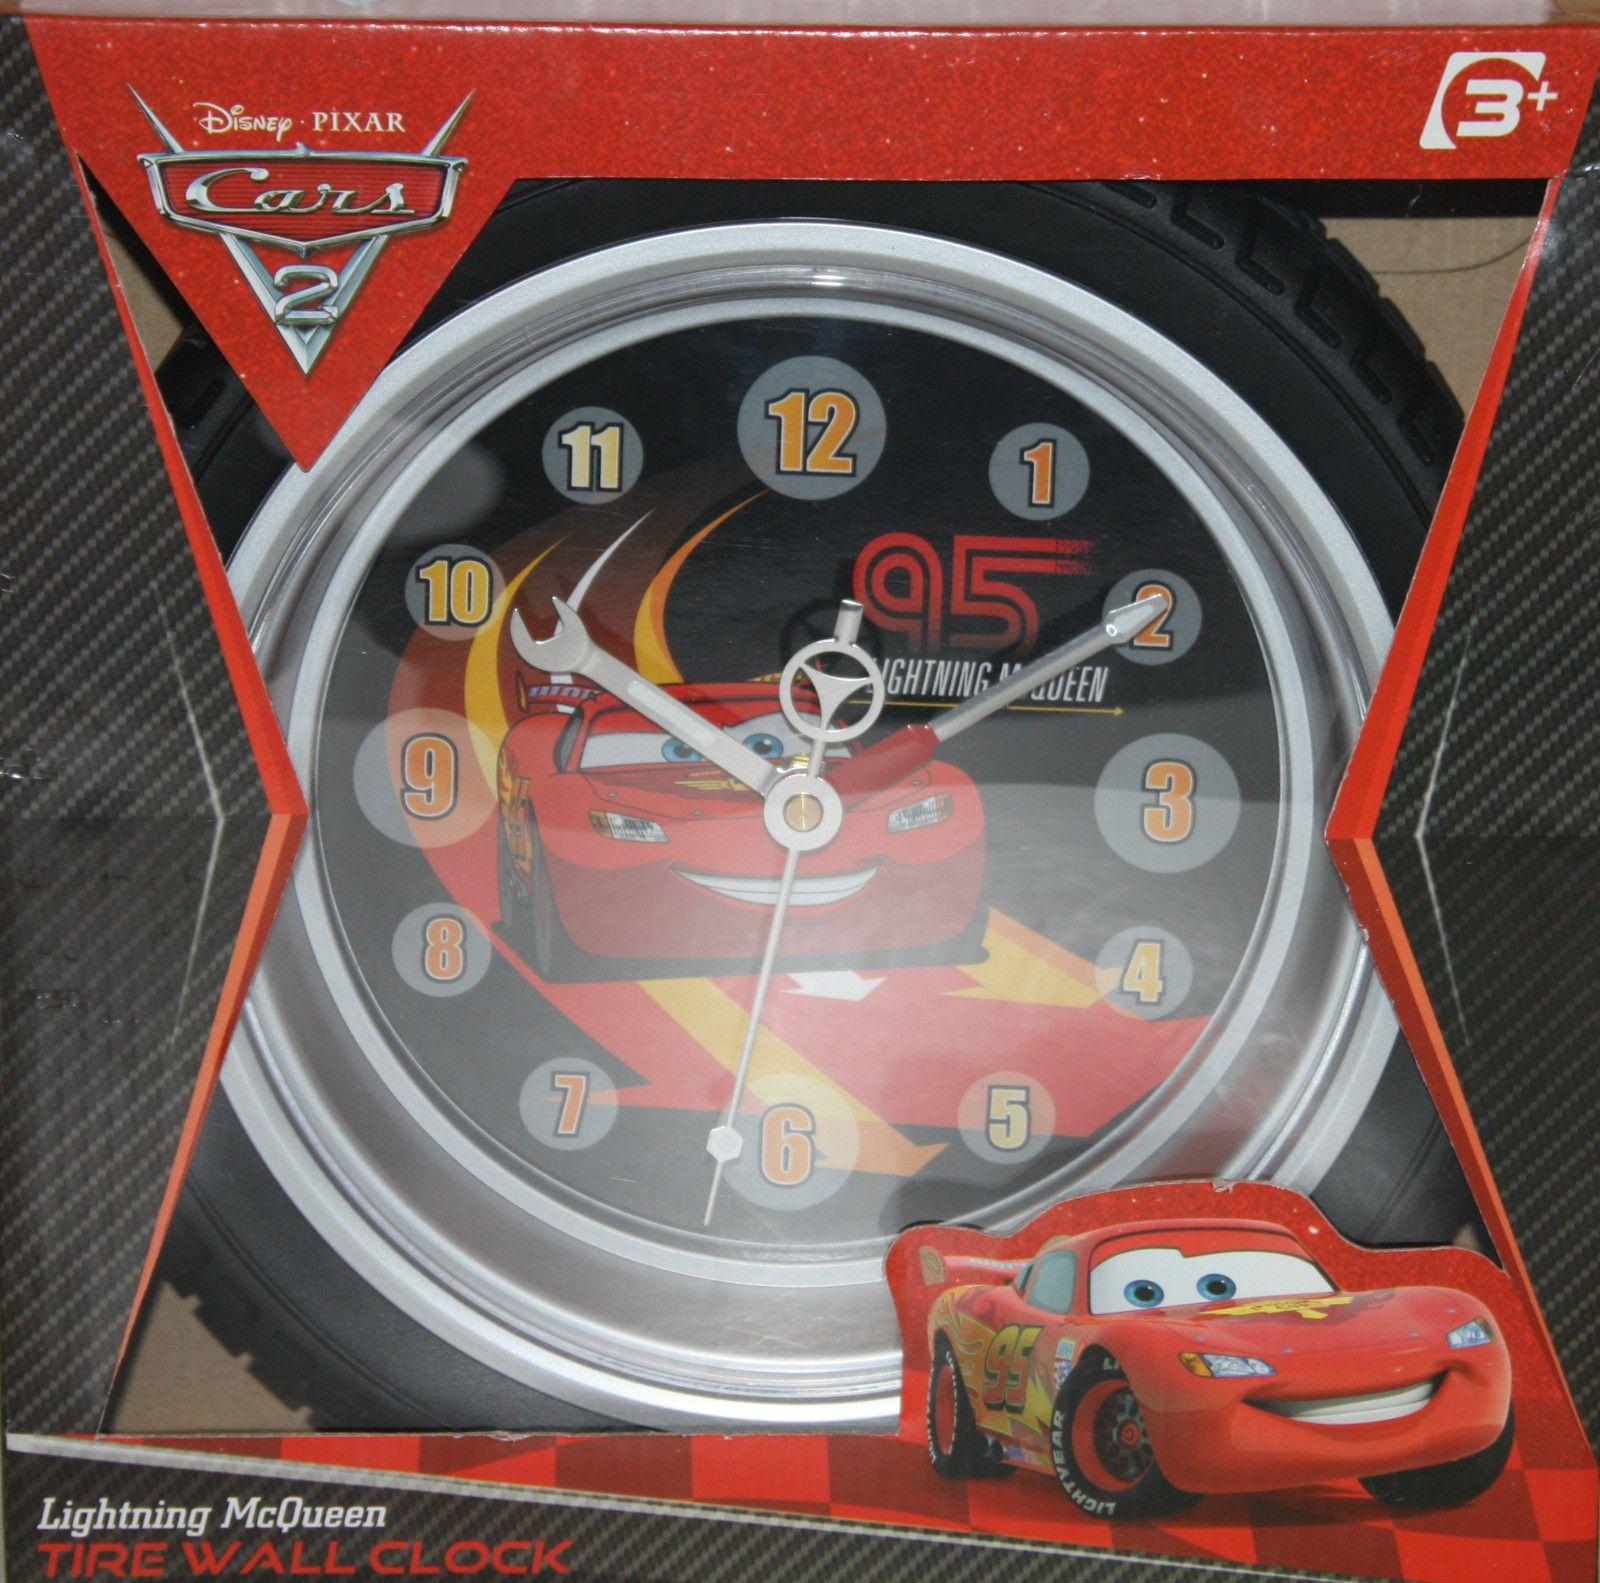 Lightning Mcqueen Bedroom Accessories Disney Cars 2 Lightning Mcqueen Tire Wall Clock Rubber Tire Case